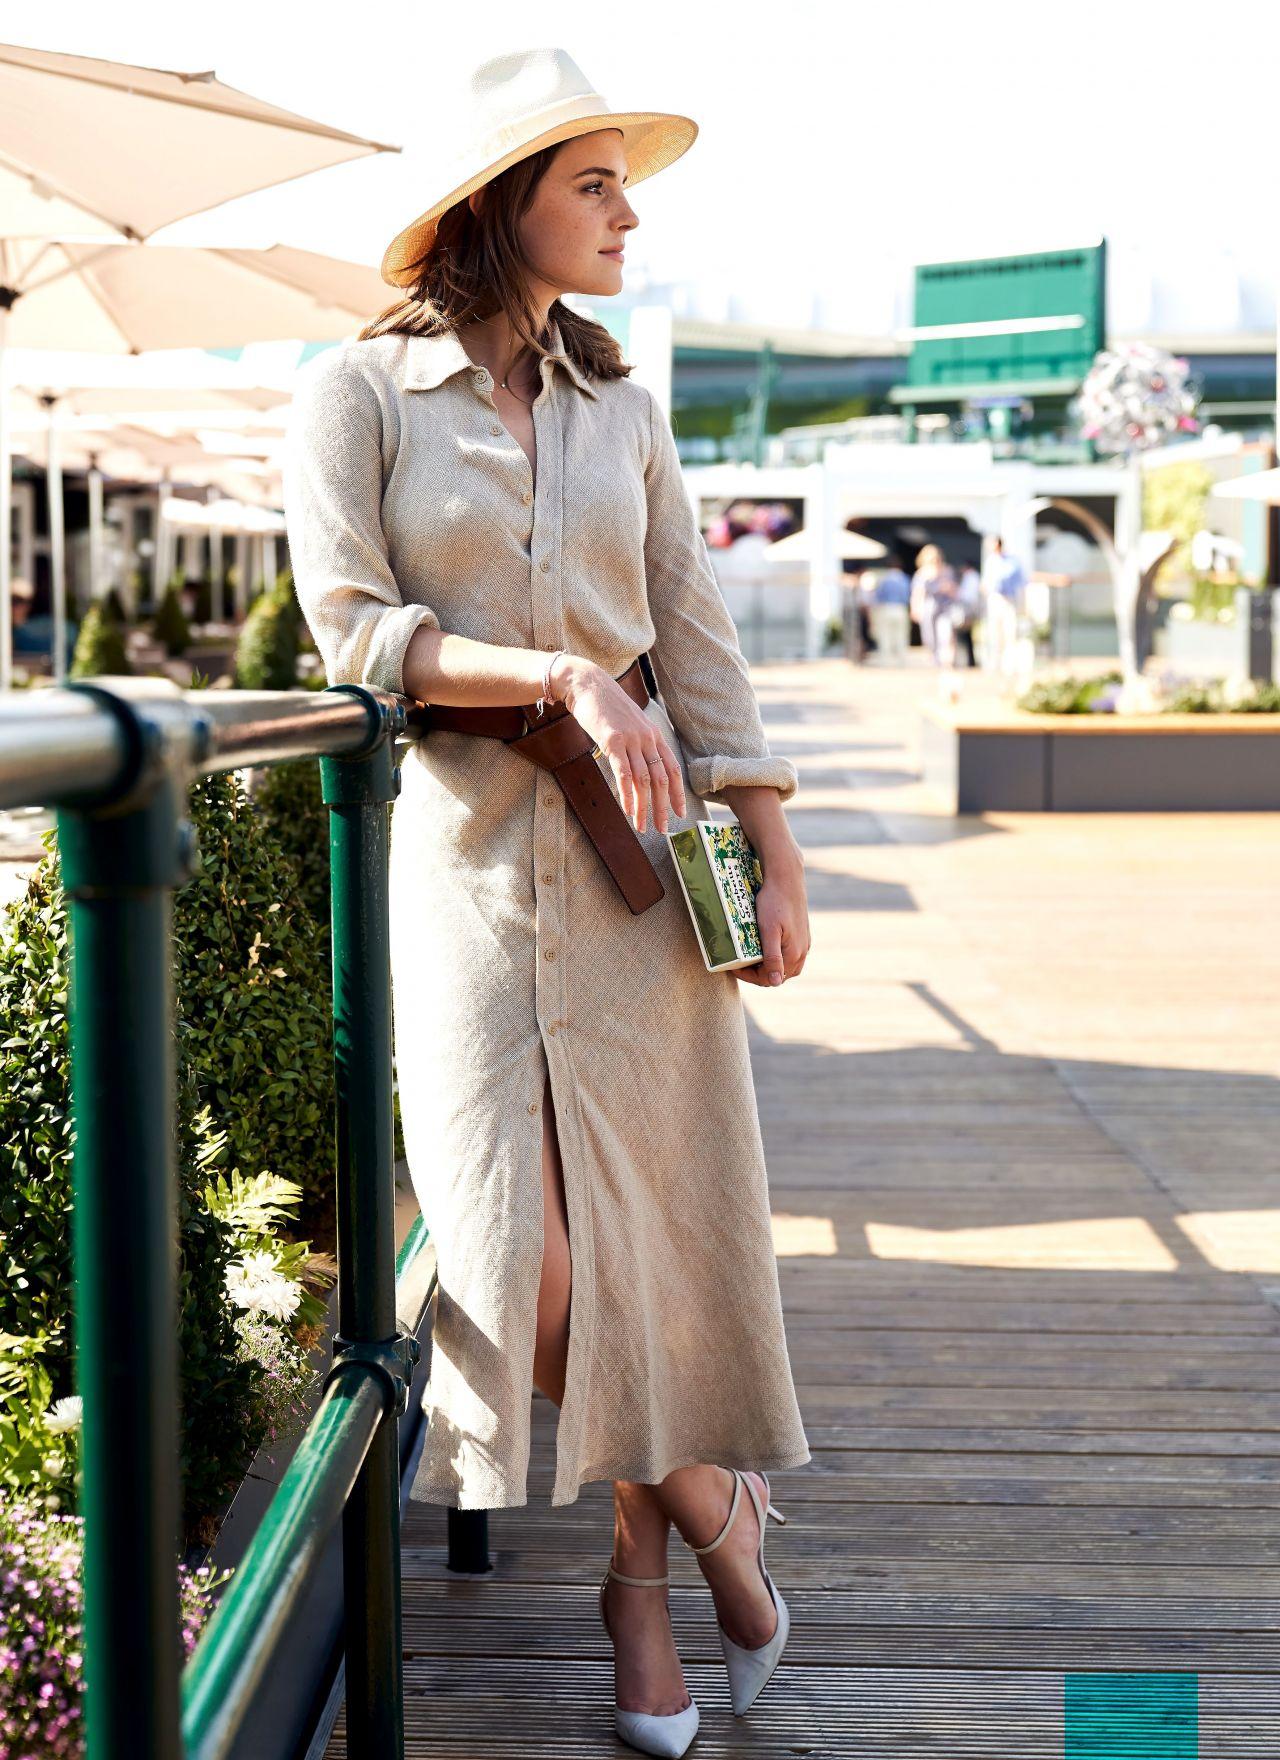 Emma Watson at The Championships at Wimbledon in London 07152018